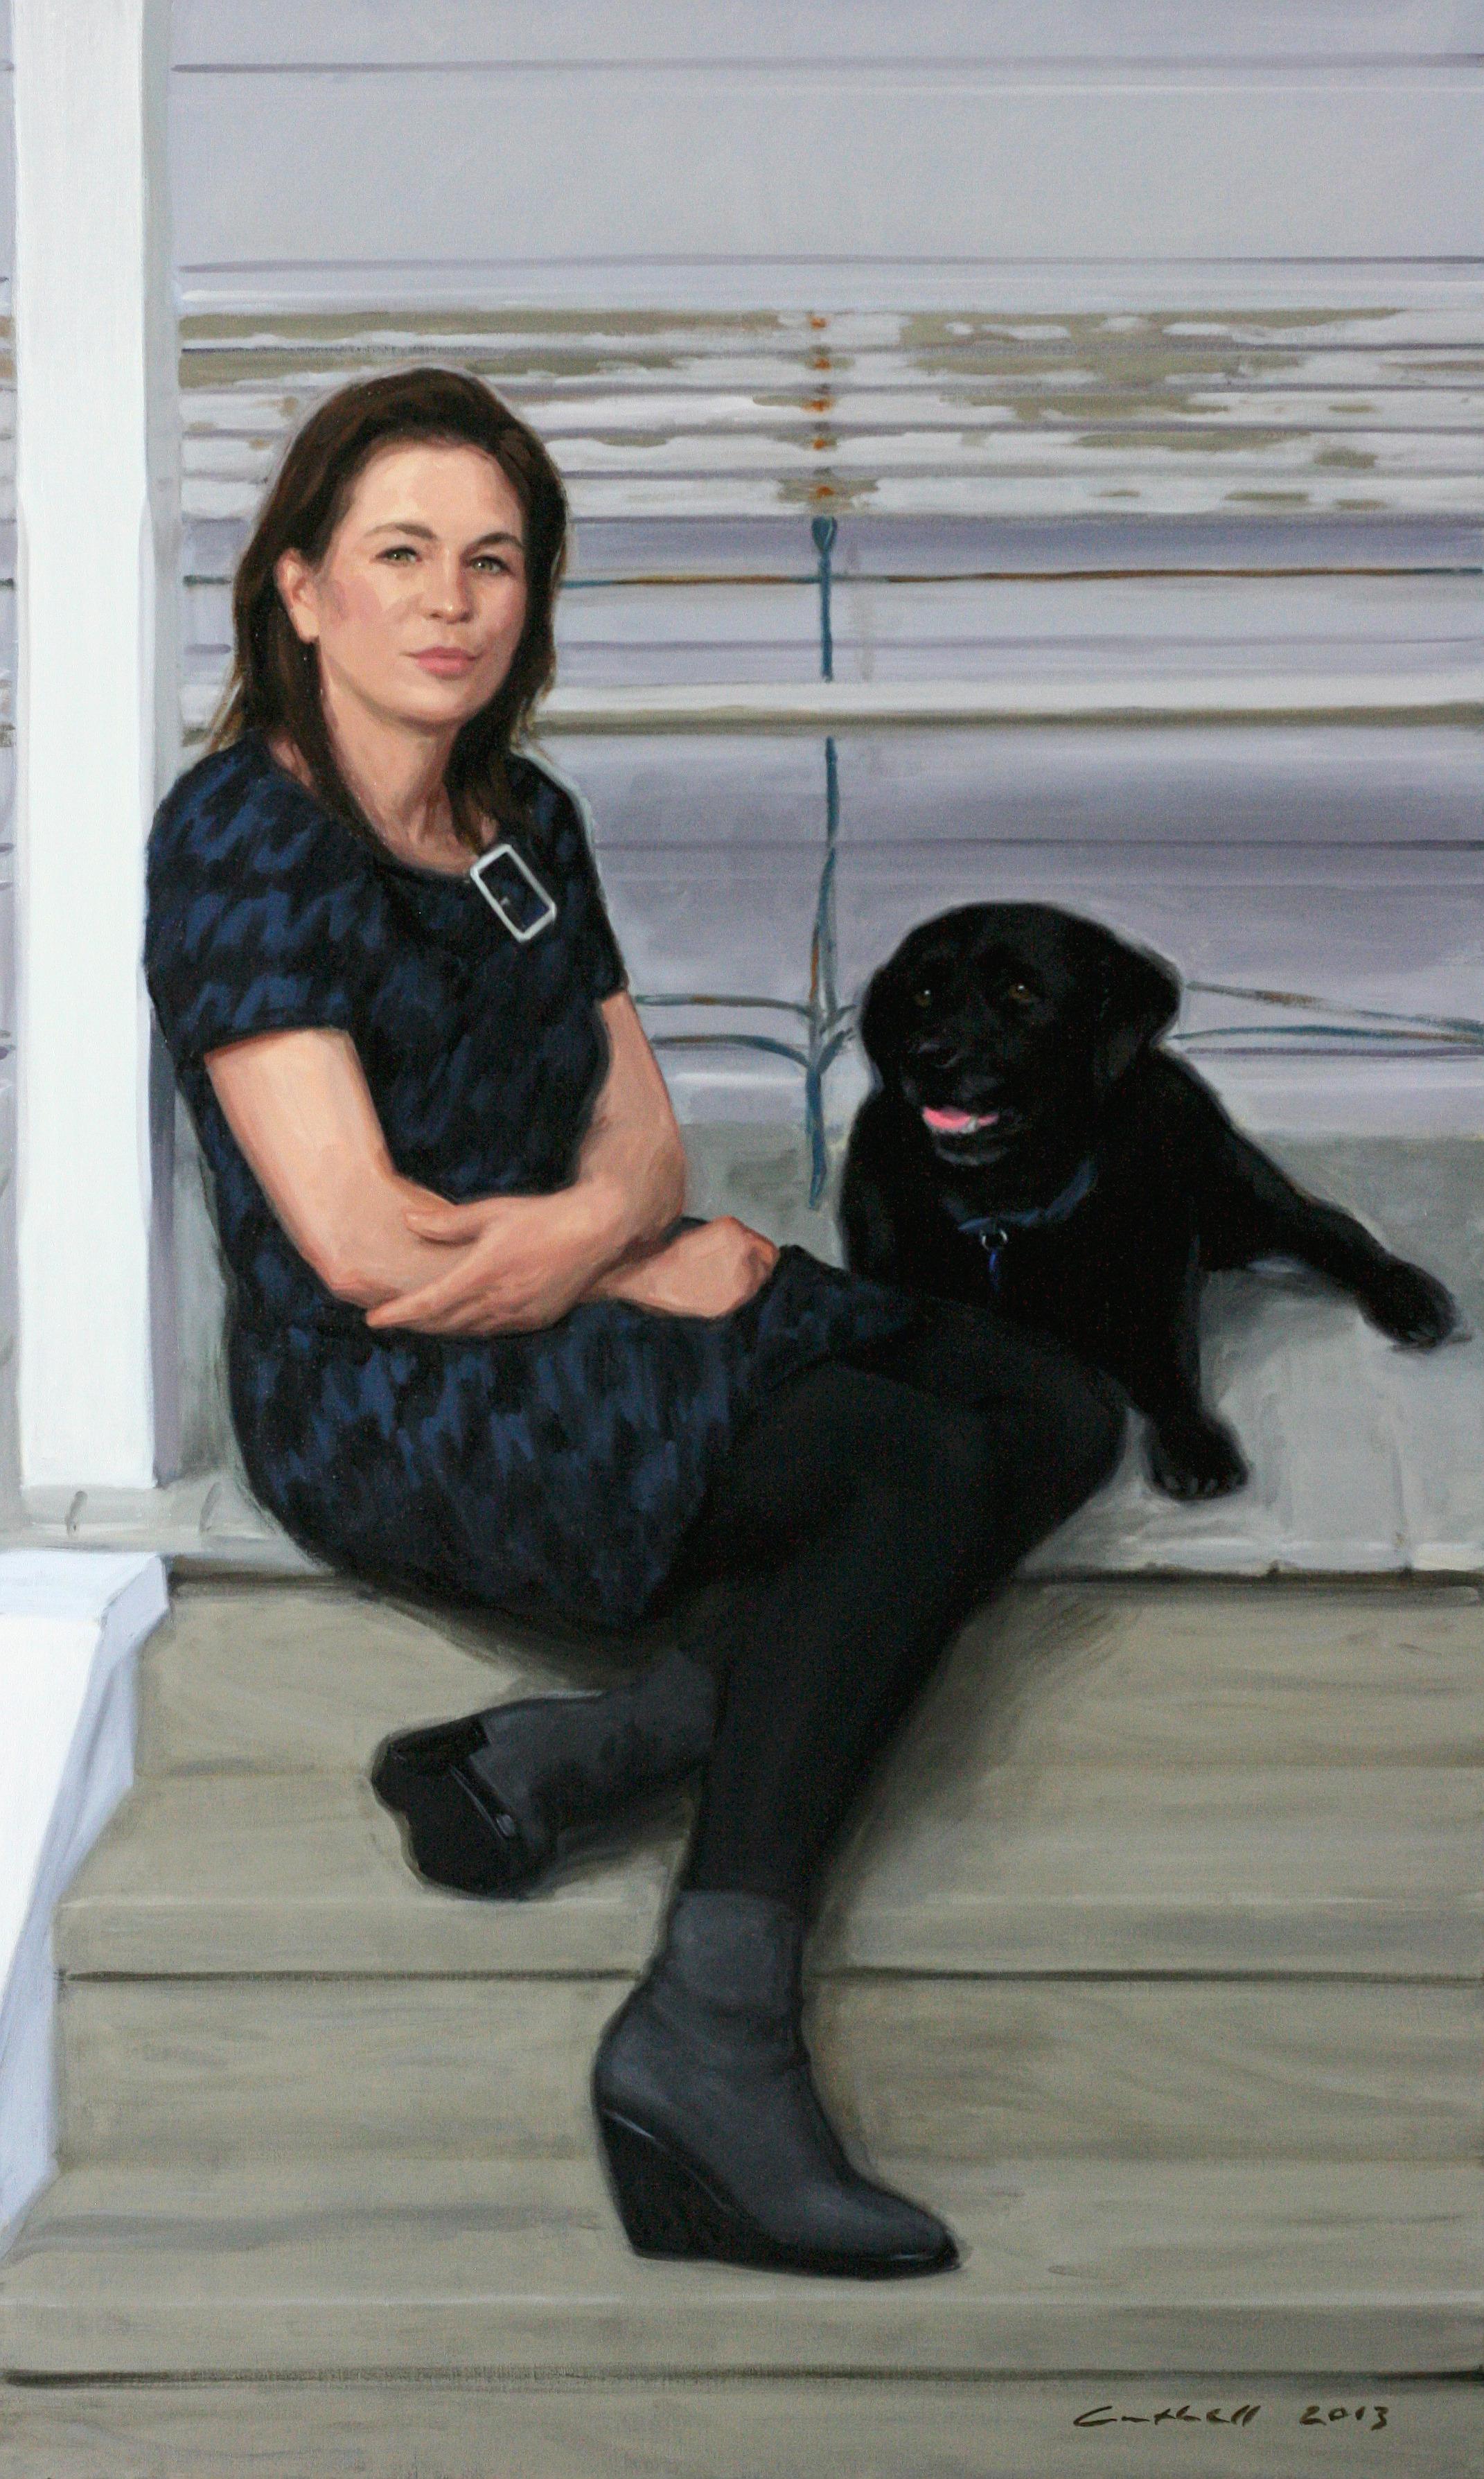 Sarah and Bobbie, Oil on Linen, 152 x 91cm, 2013